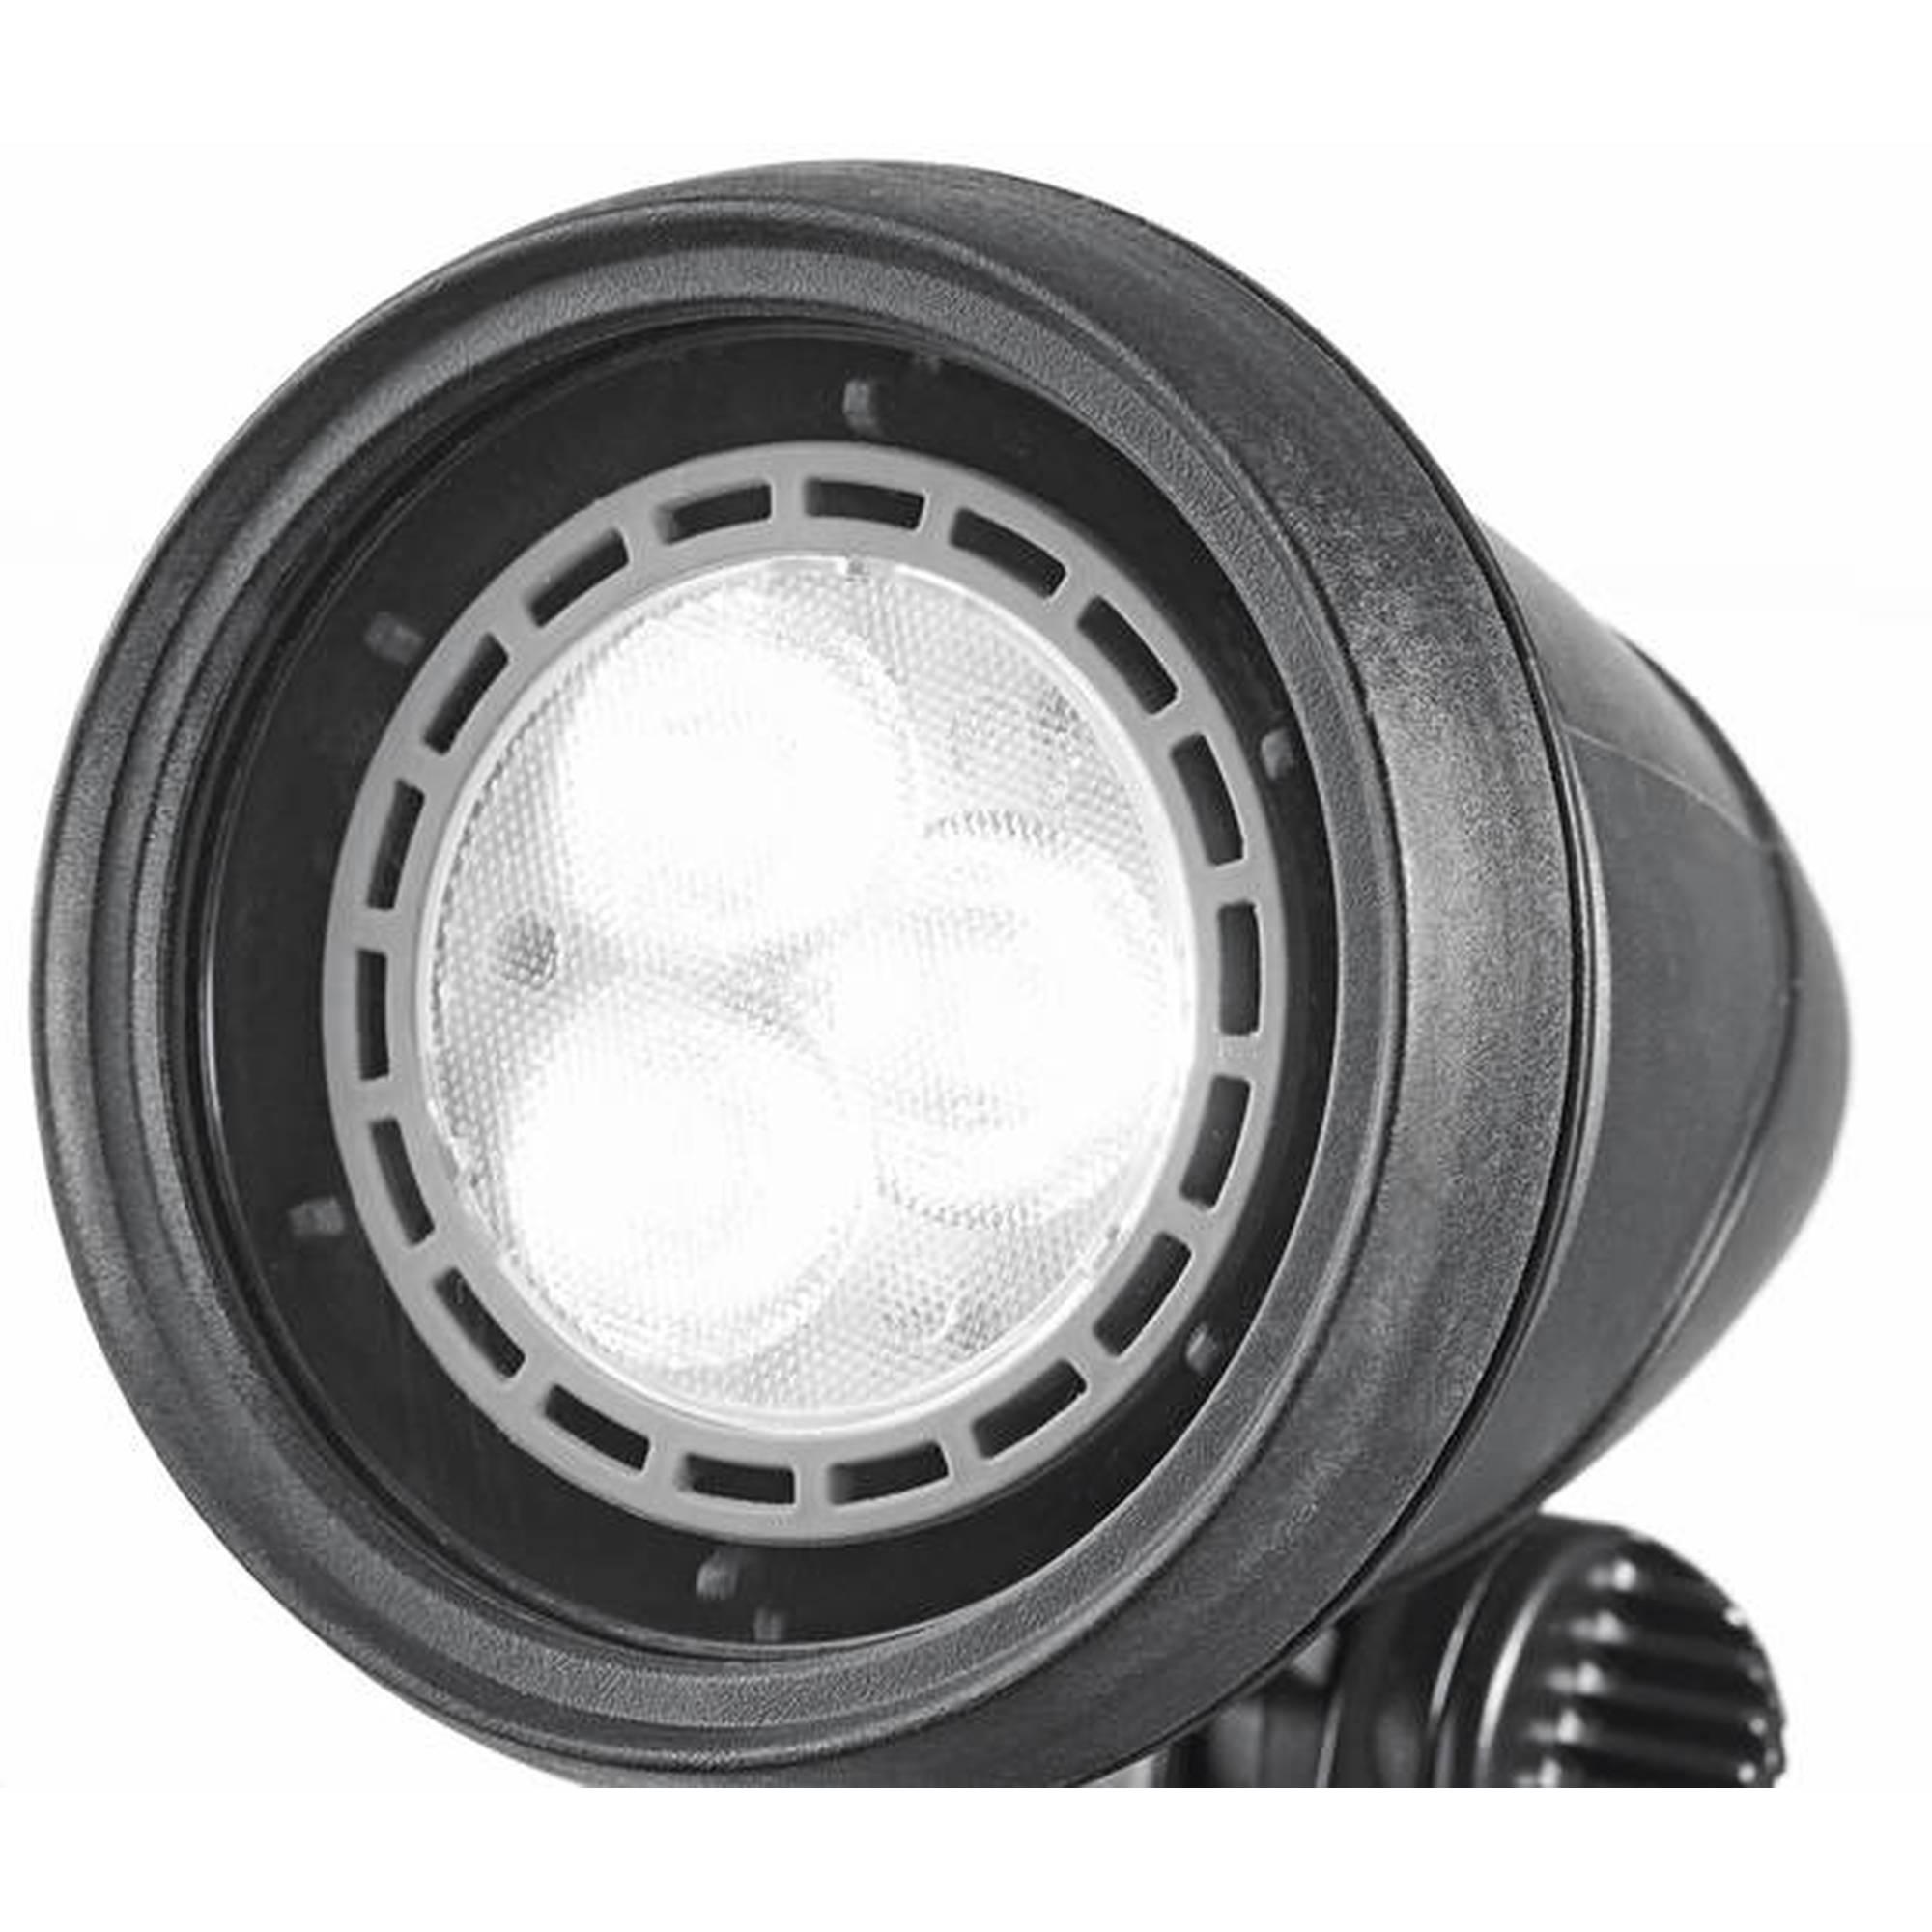 OASE Lunaqua Classic LED Set 1 Teich-und Gartenbeleuchtung